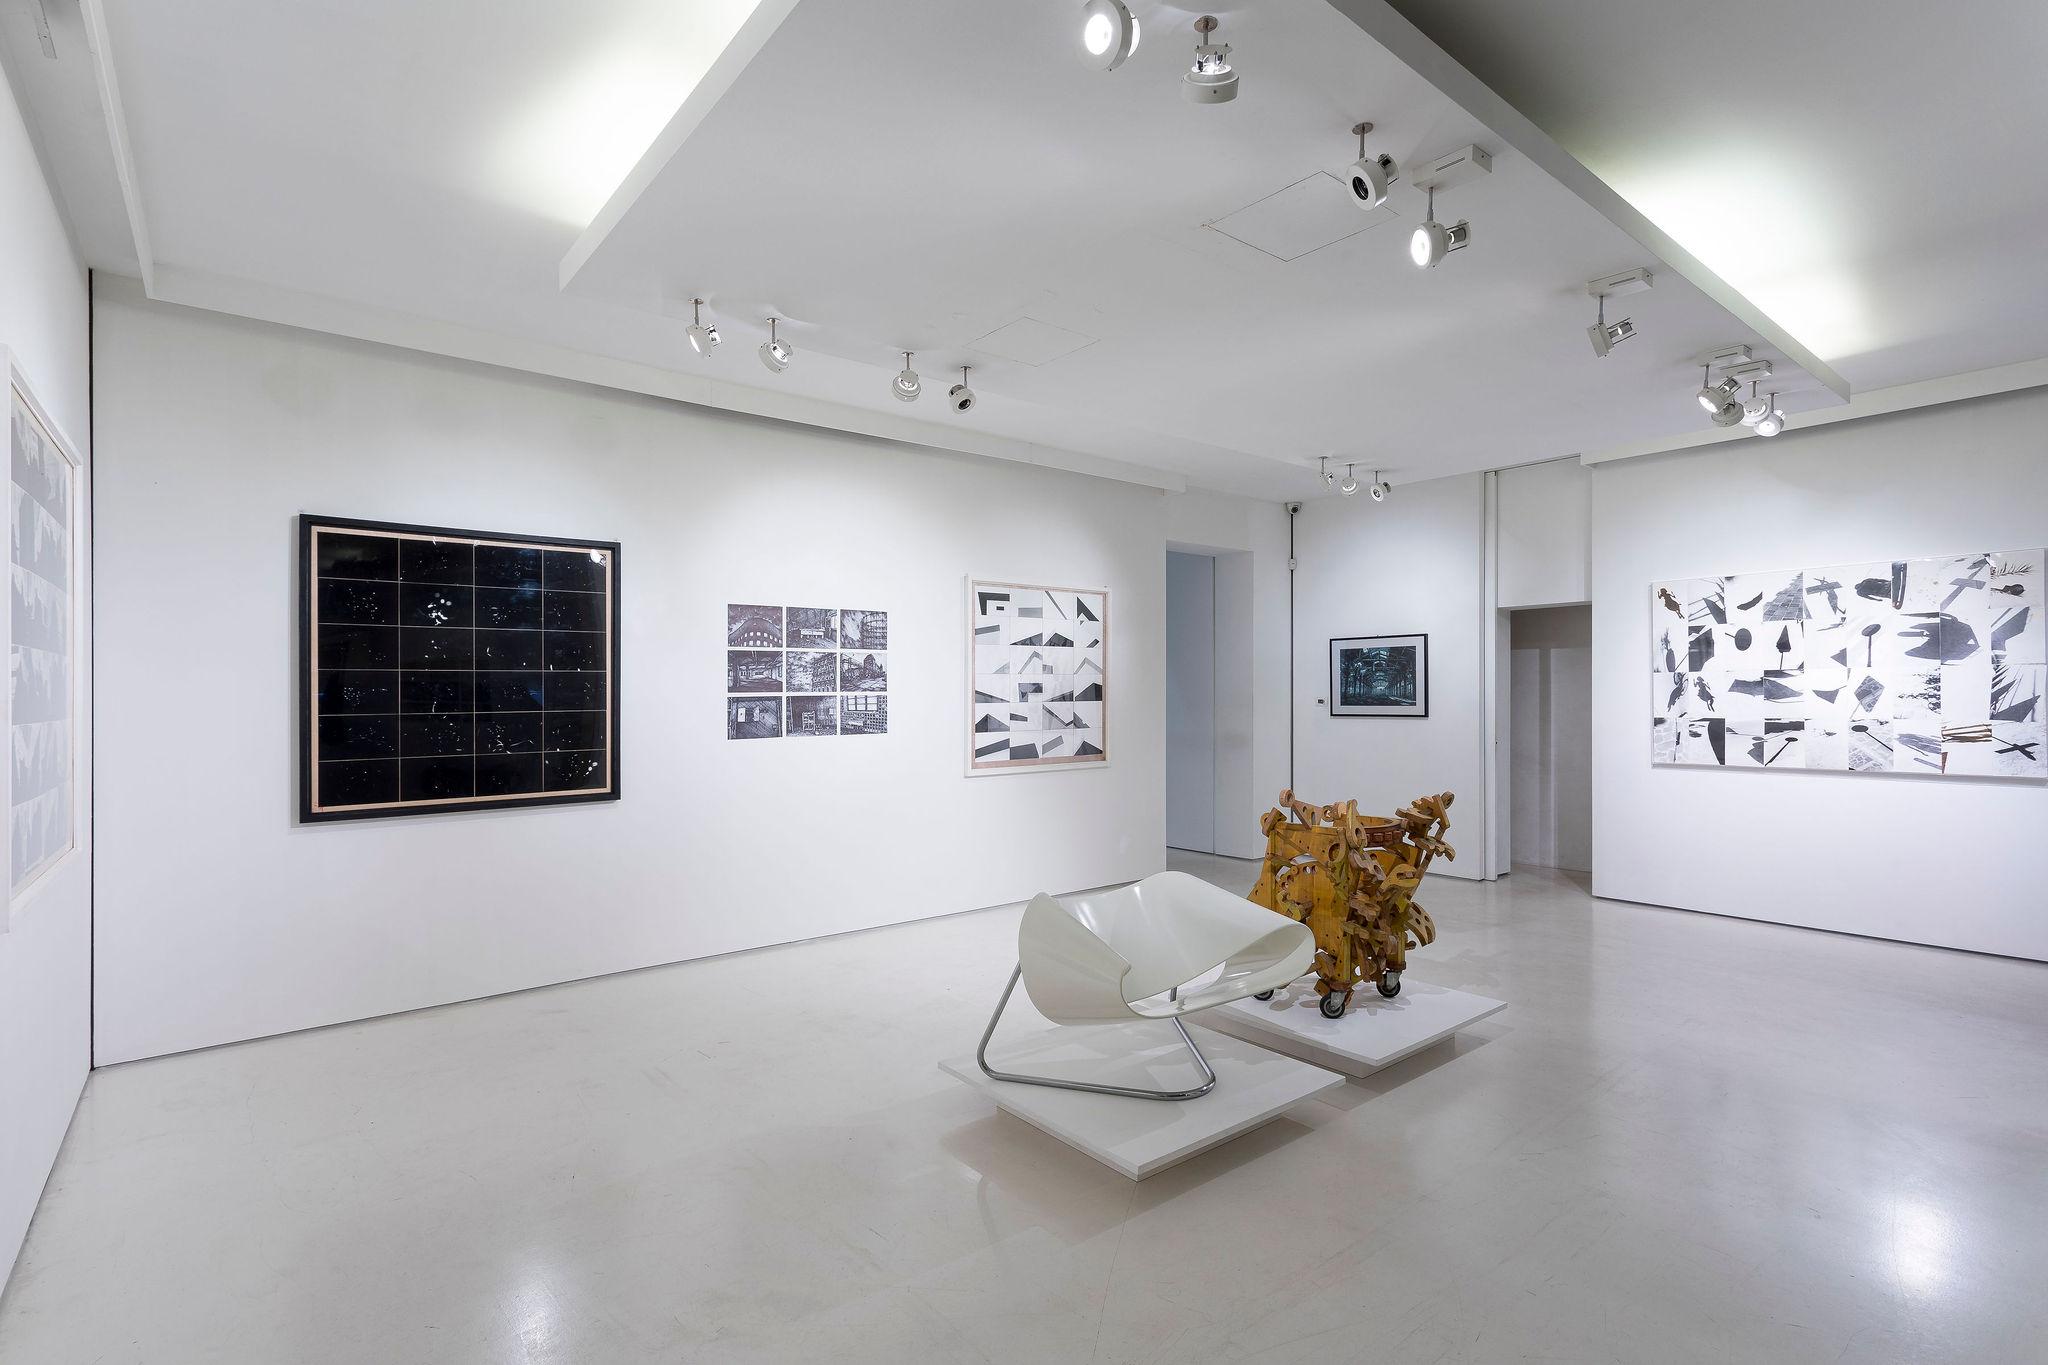 Galleria Antonio Verolino